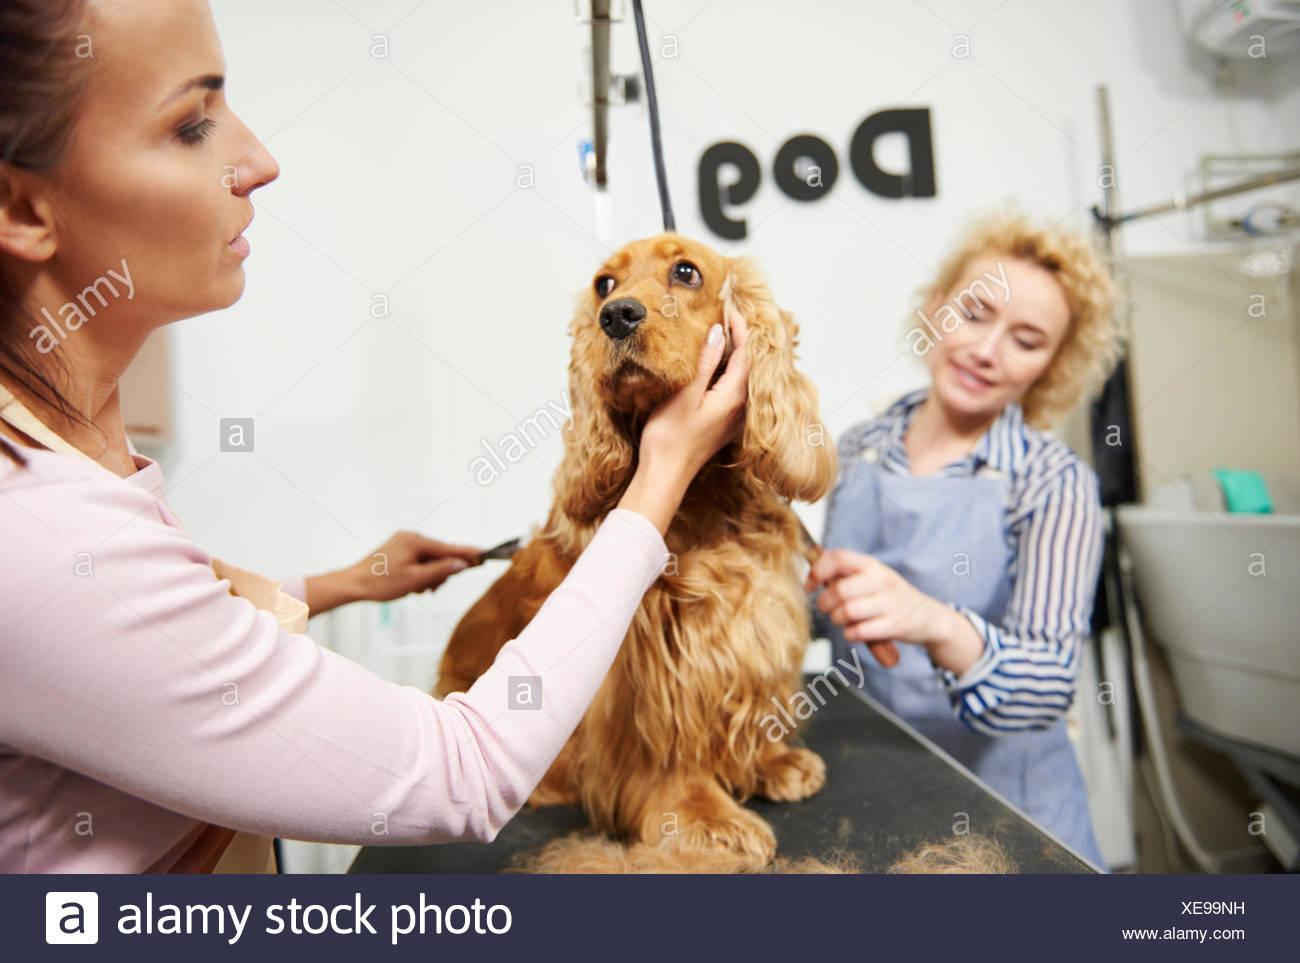 Female groomers brushing cocker spaniel at dog grooming salon - Stock Image